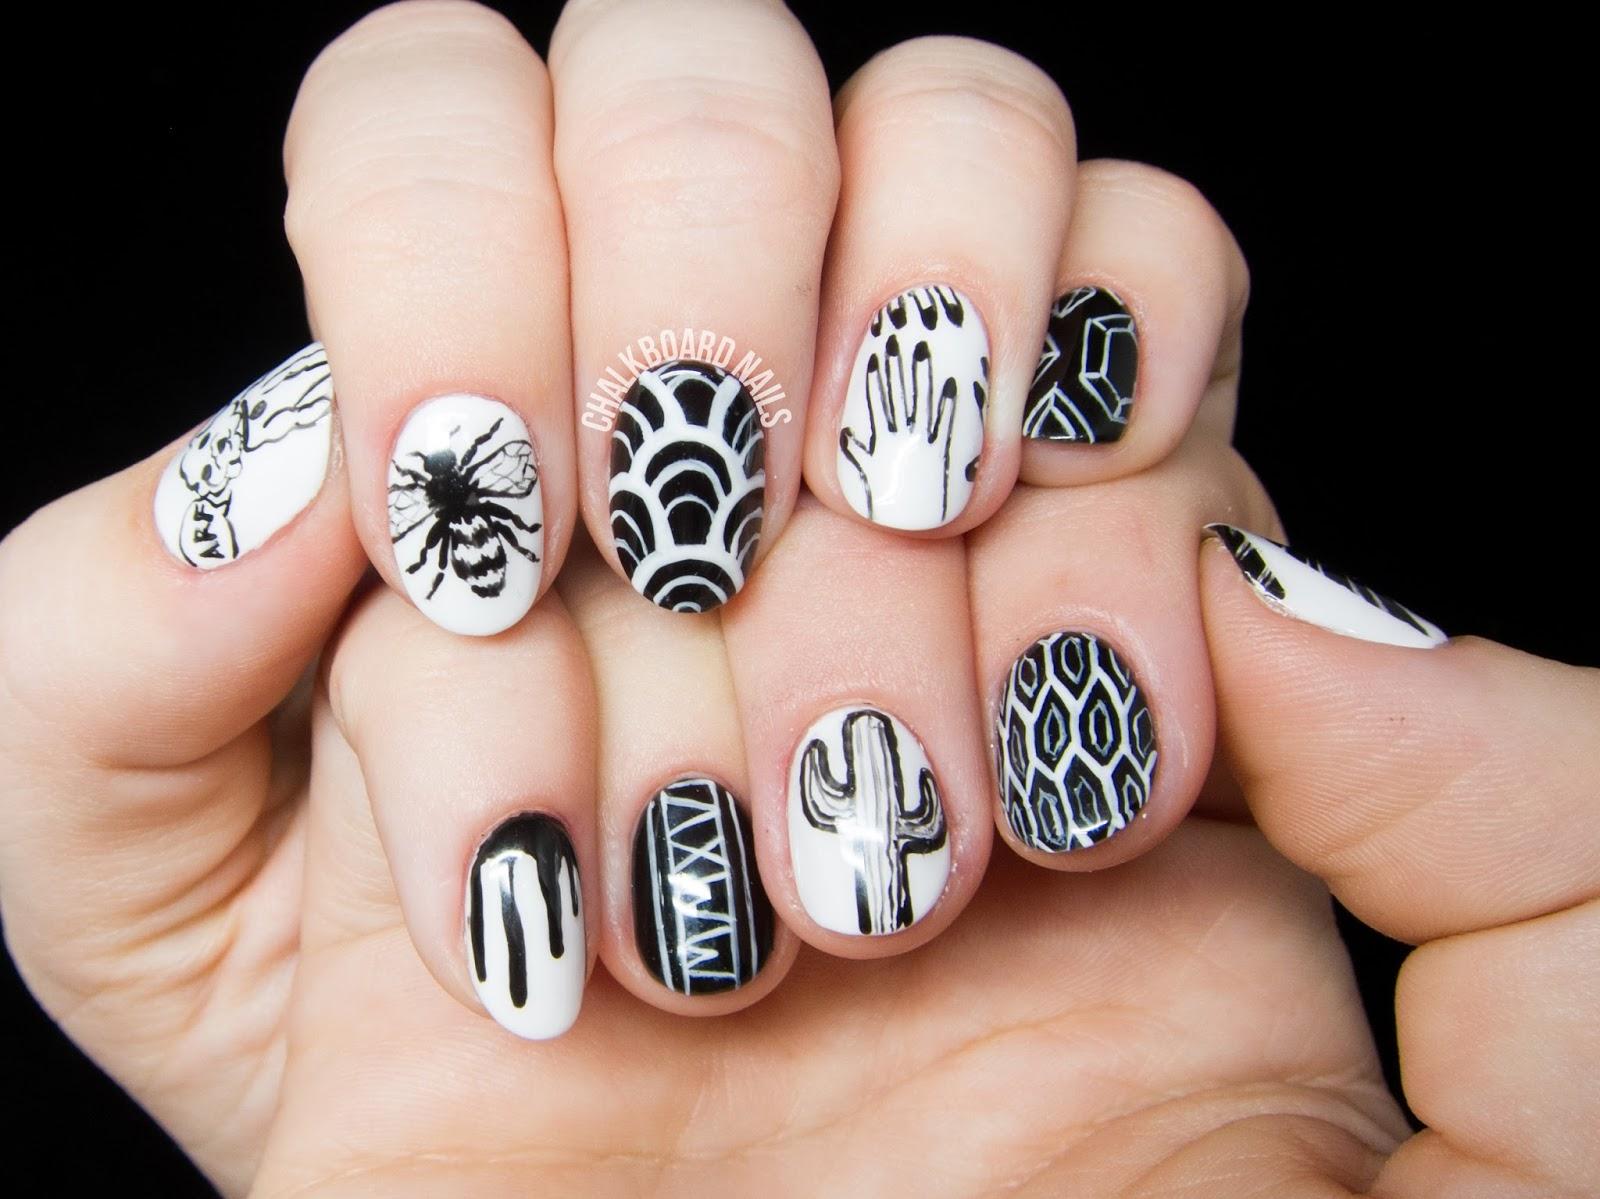 Nail Polish Art Black And White Papillon Day Spa